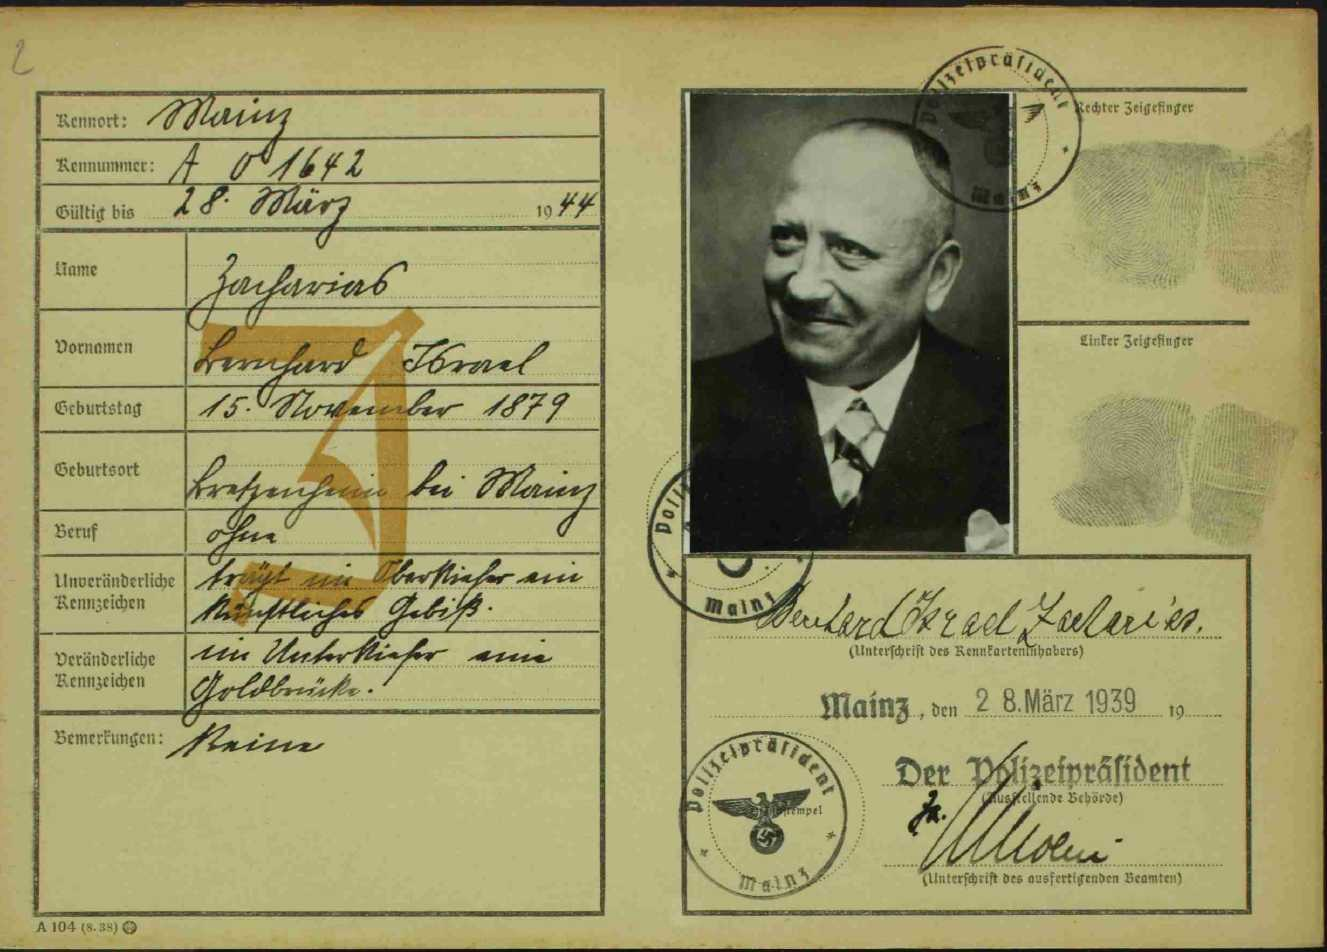 http://www.alemannia-judaica.de/images/Images%20384/Bretzenheim%20KK%20MZ%20Zacharias%20Bernhard.jpg